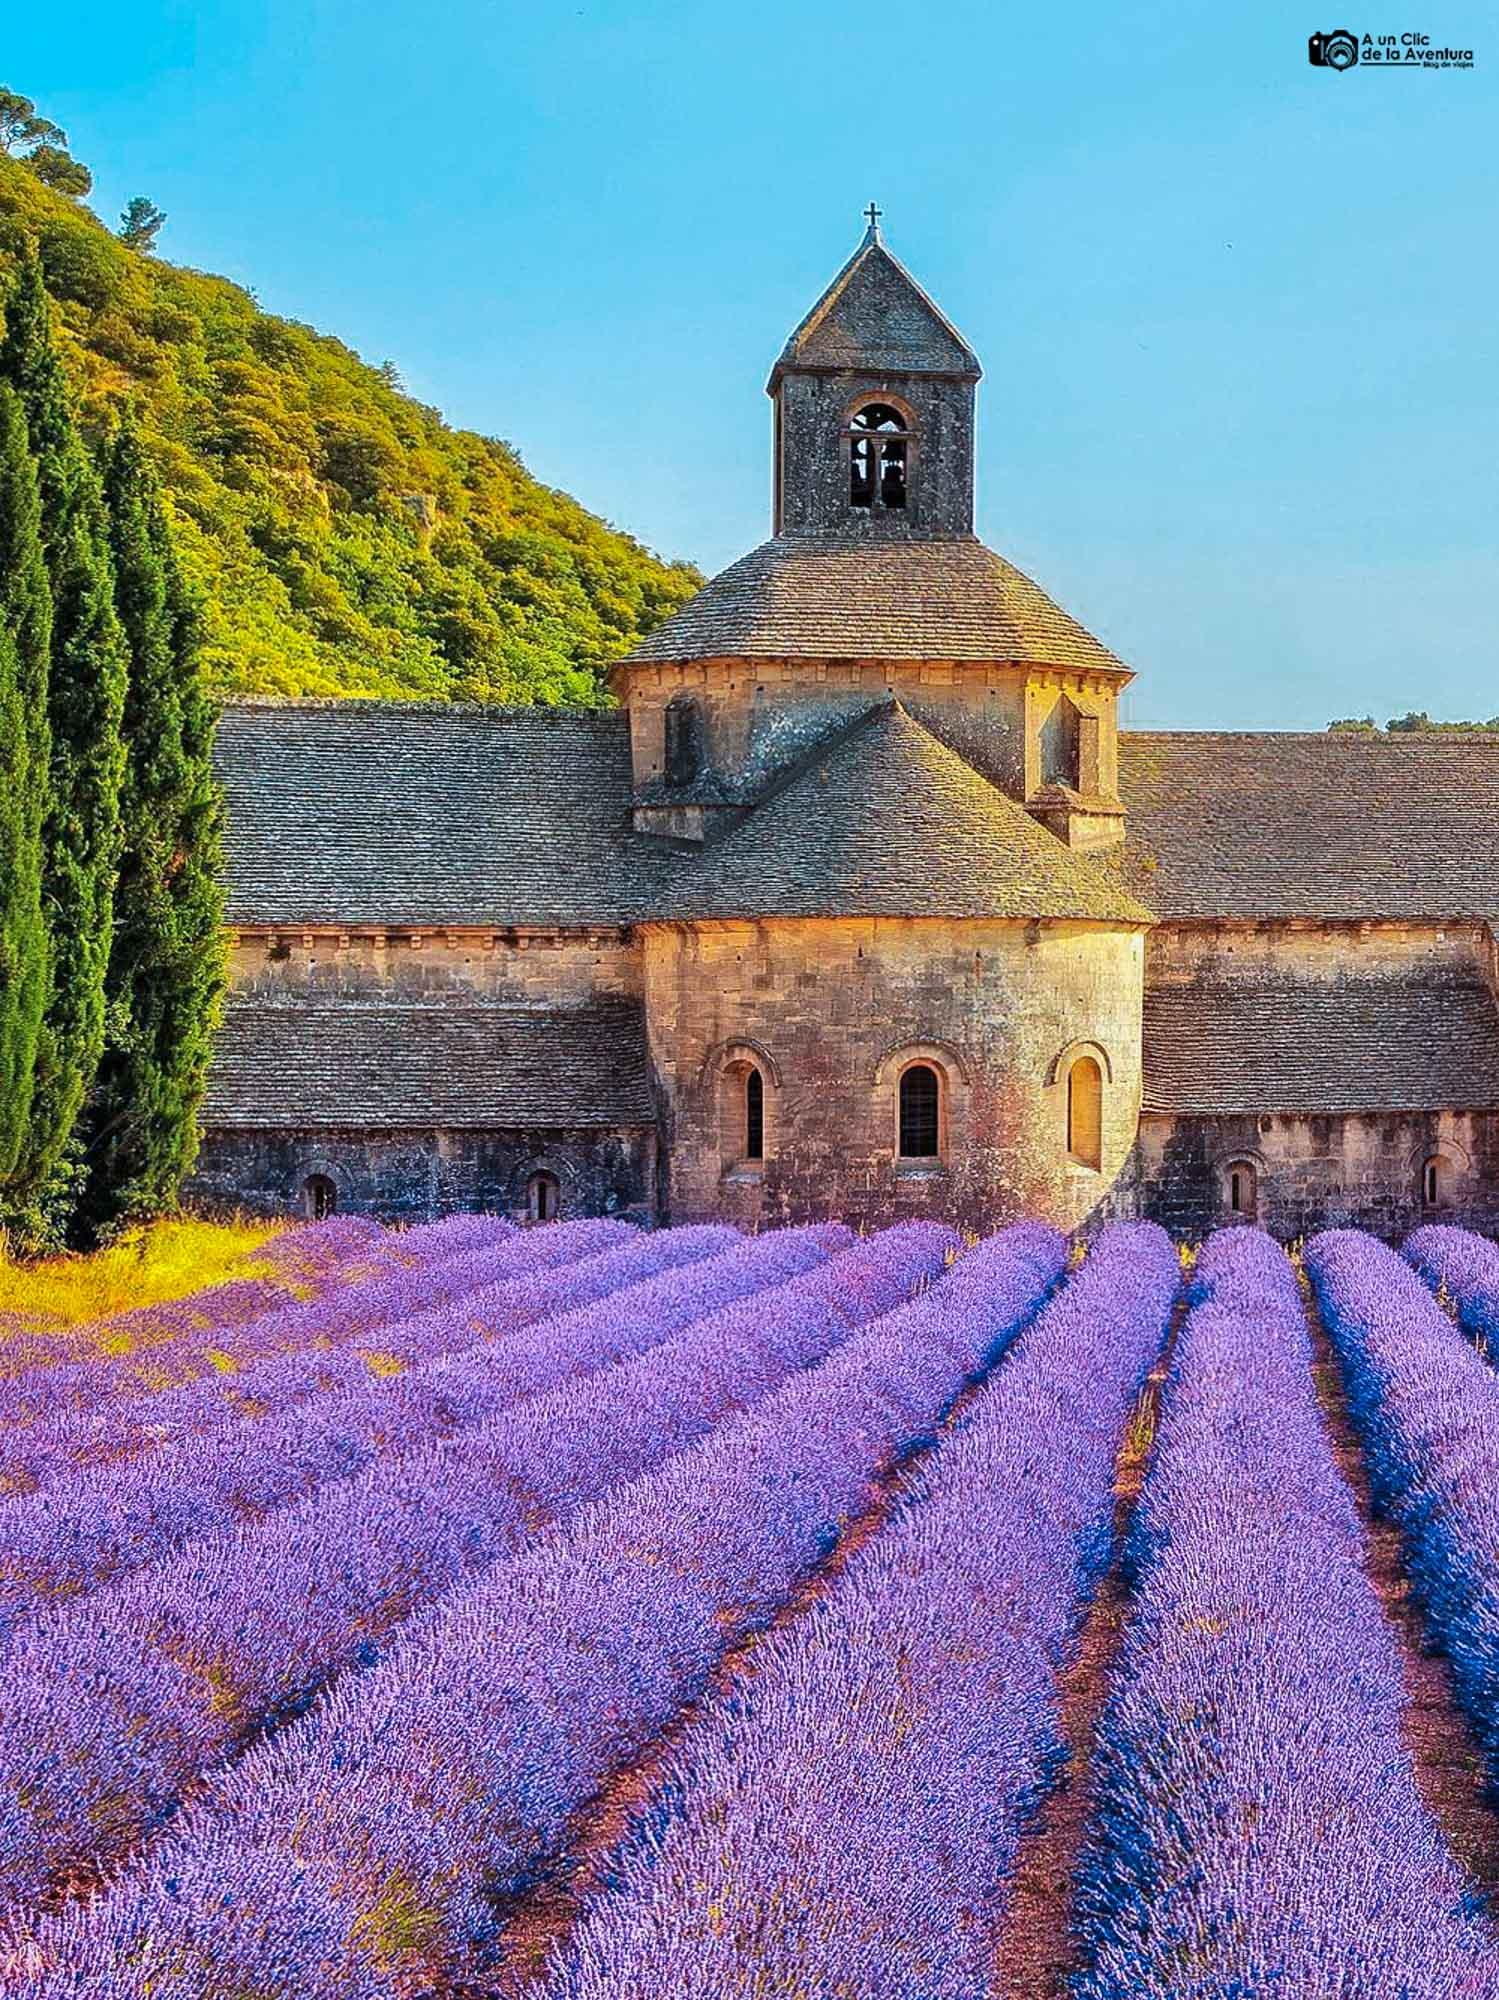 Abadía de Senanque que ver cerca de Avignon